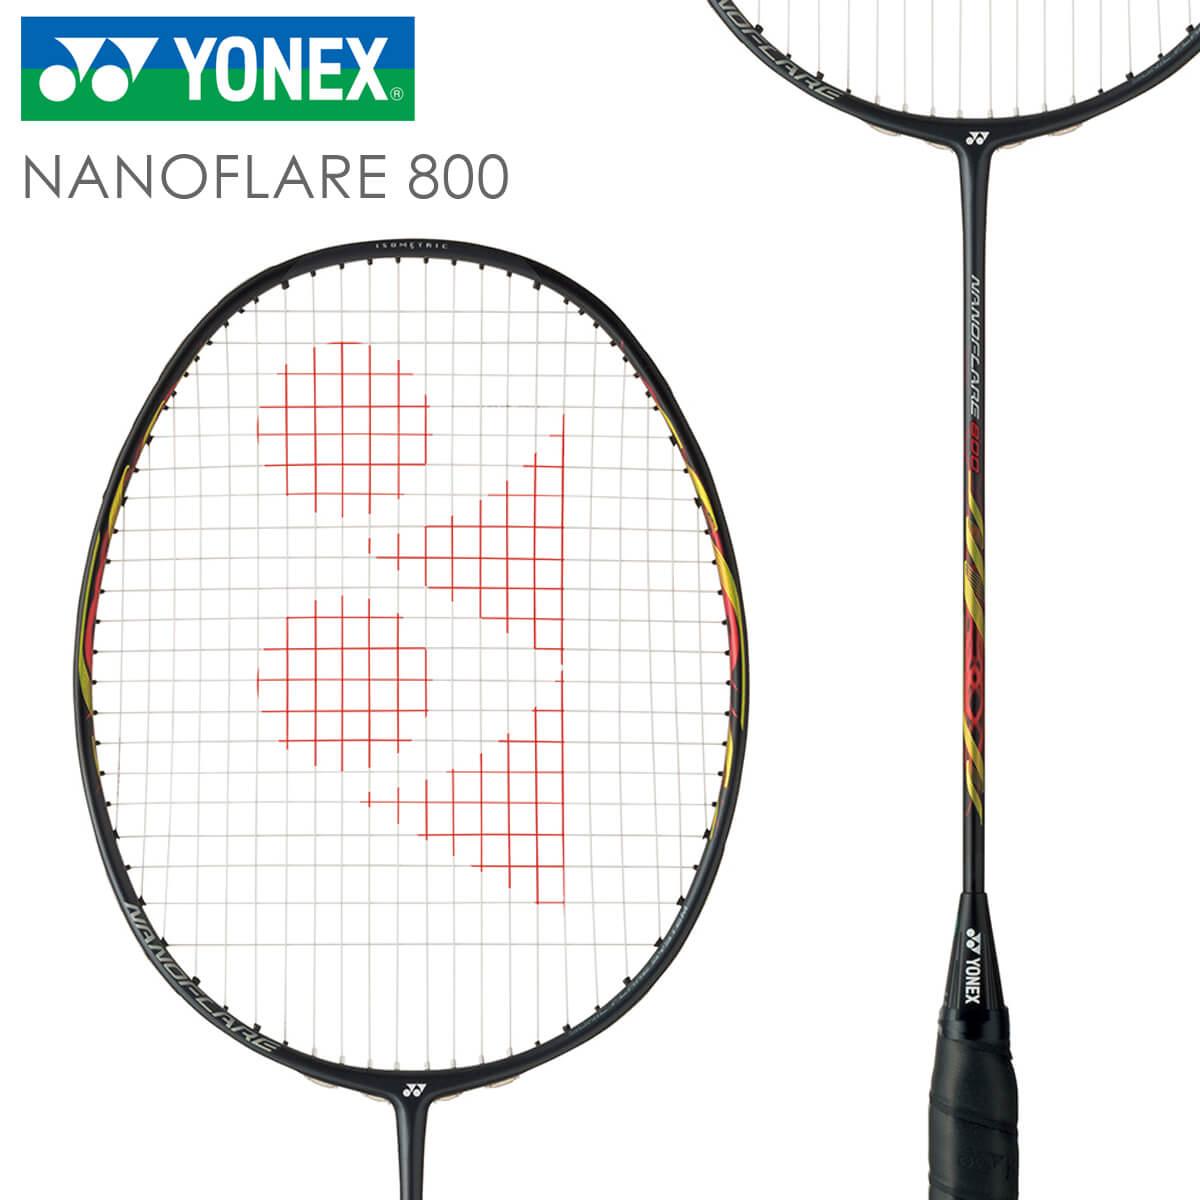 YONEX NF-800 ナノフレア800 NANOFLARE 800 バドミントンラケット ヨネックス【日本バドミントン協会審査合格品/ガット張り工賃無料】